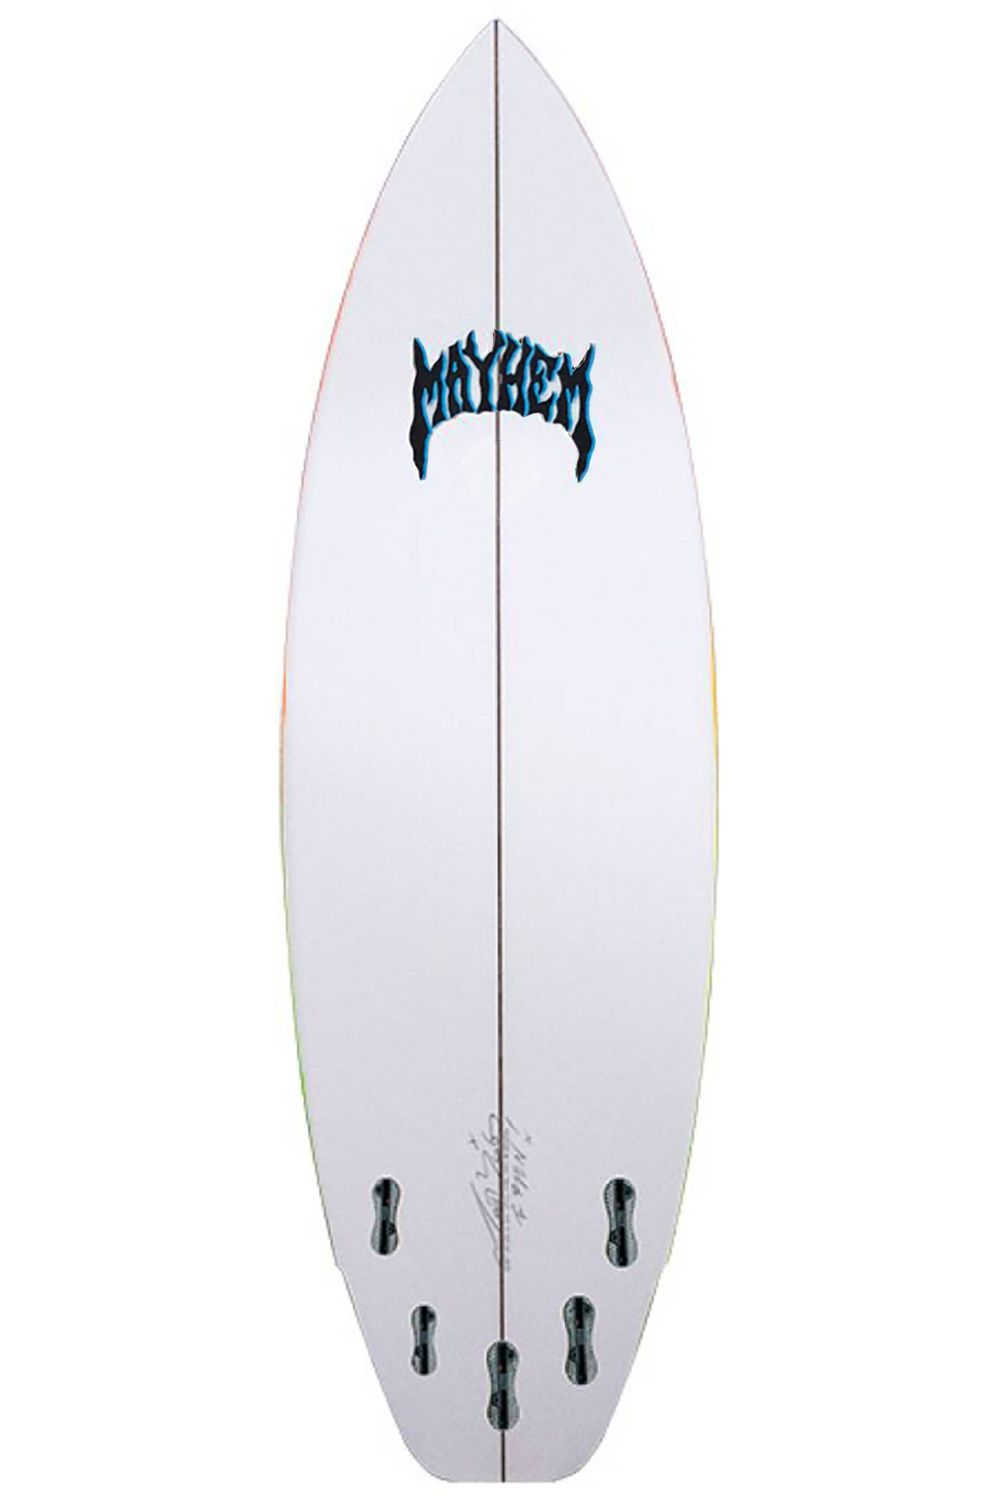 Prancha Surf Lost RAD RIPPER 5'8 Squash Tail - Color FCS II Multisystem 5ft8